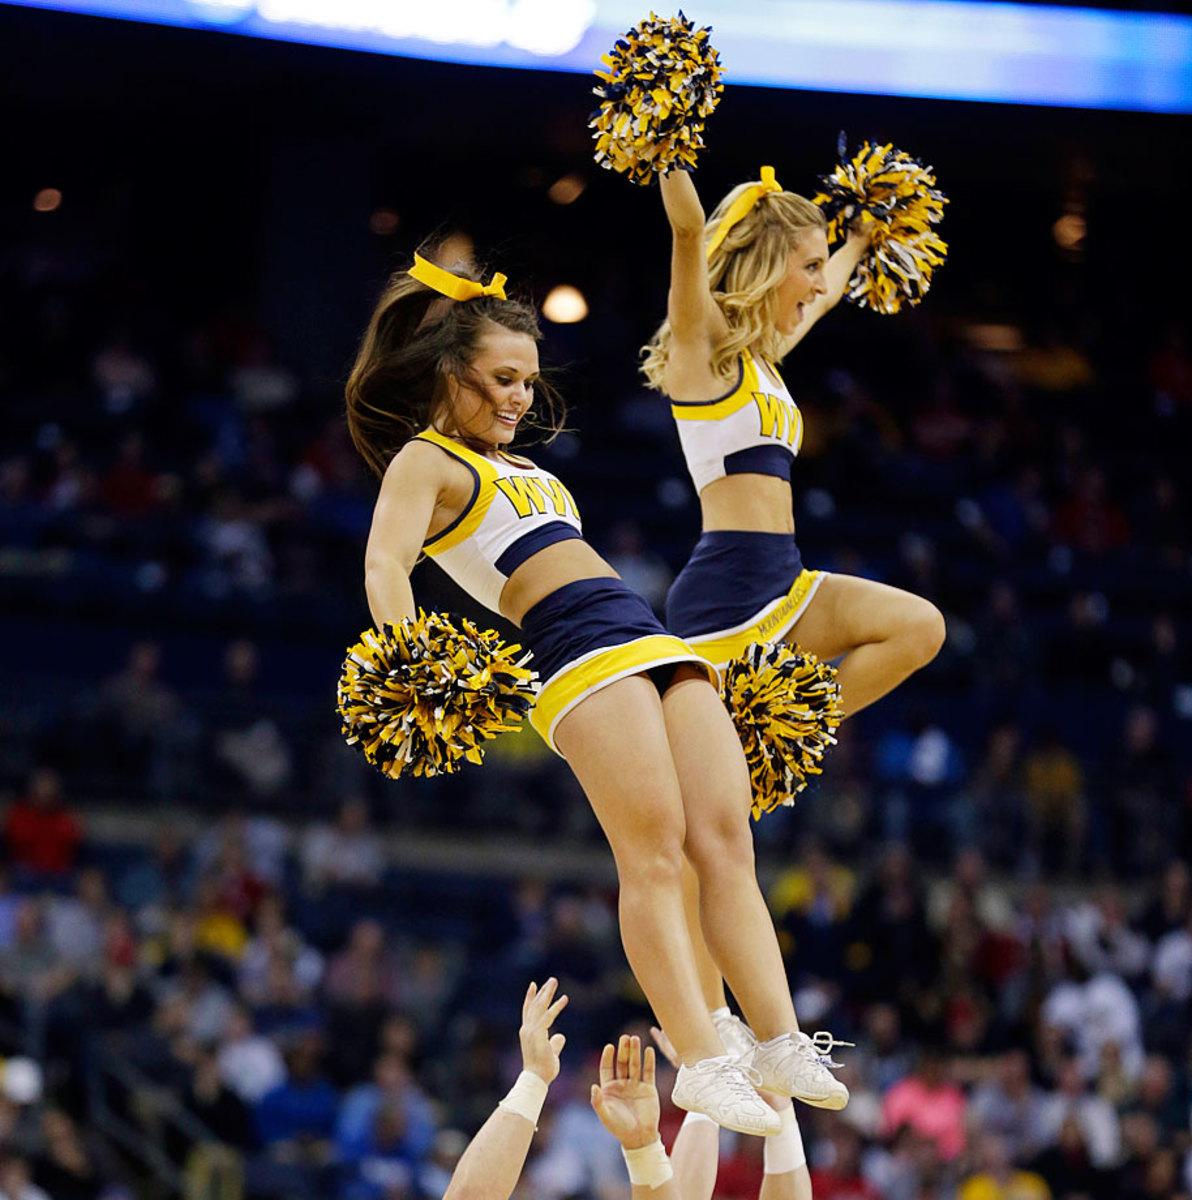 West-Virginia-cheerleaders-15e2b3202fc744adaa73c718fc2b6398-0.jpg